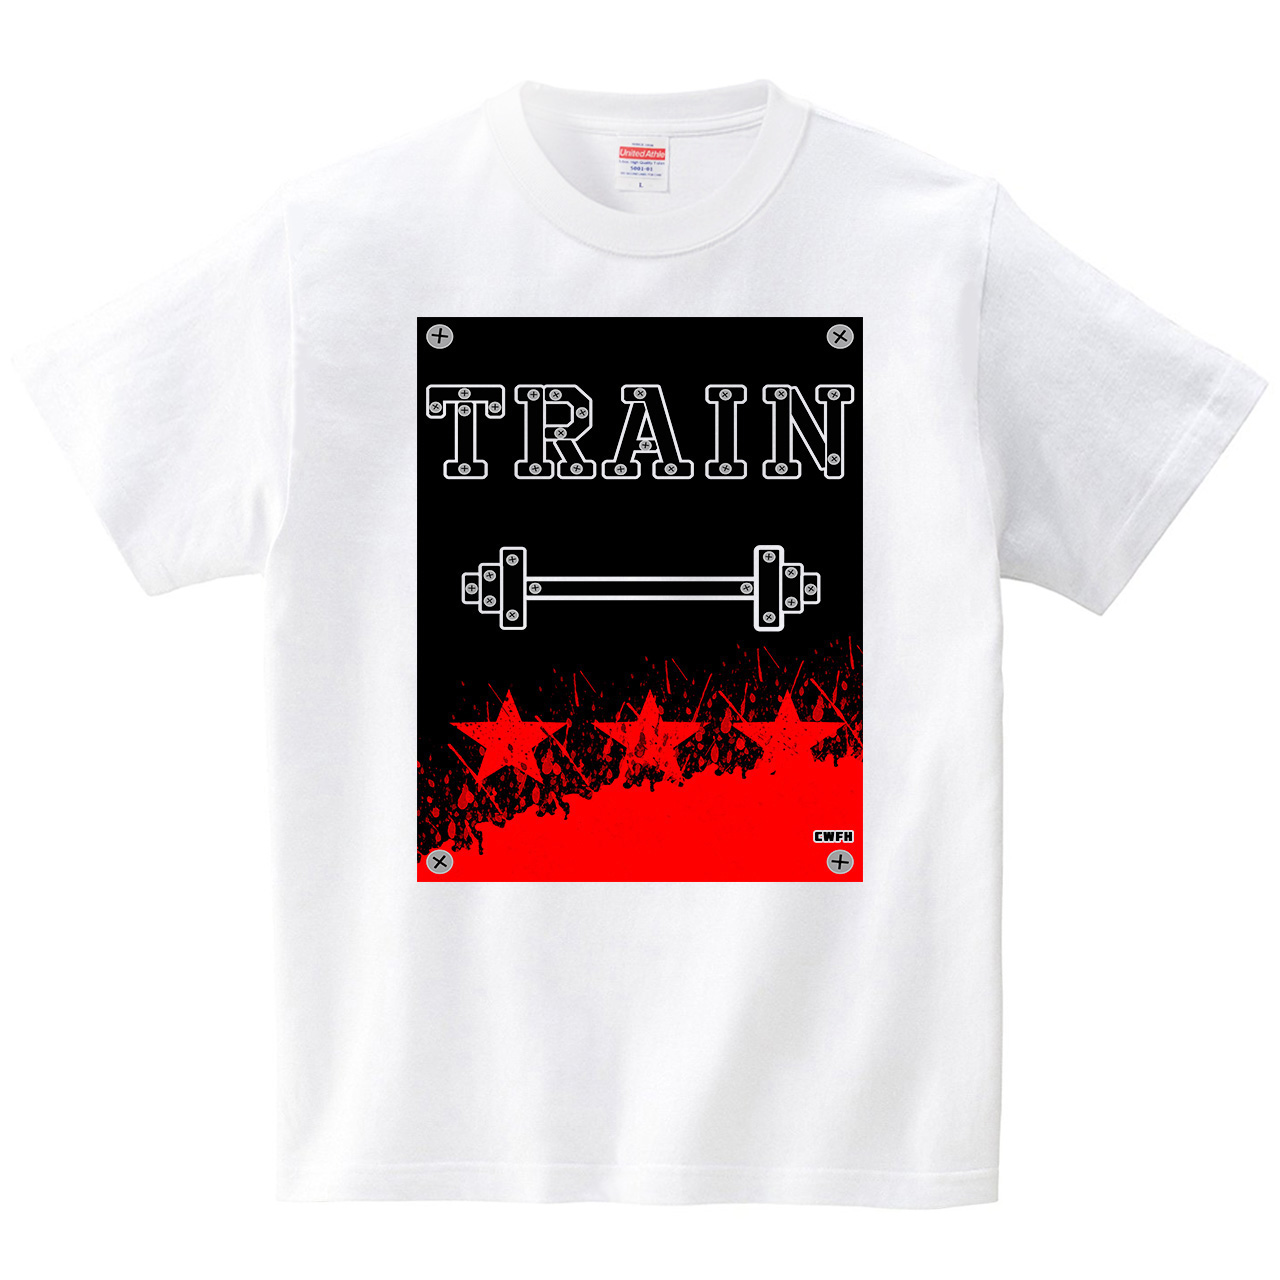 TRAIN(Tシャツ・ホワイト)(貢利宋)